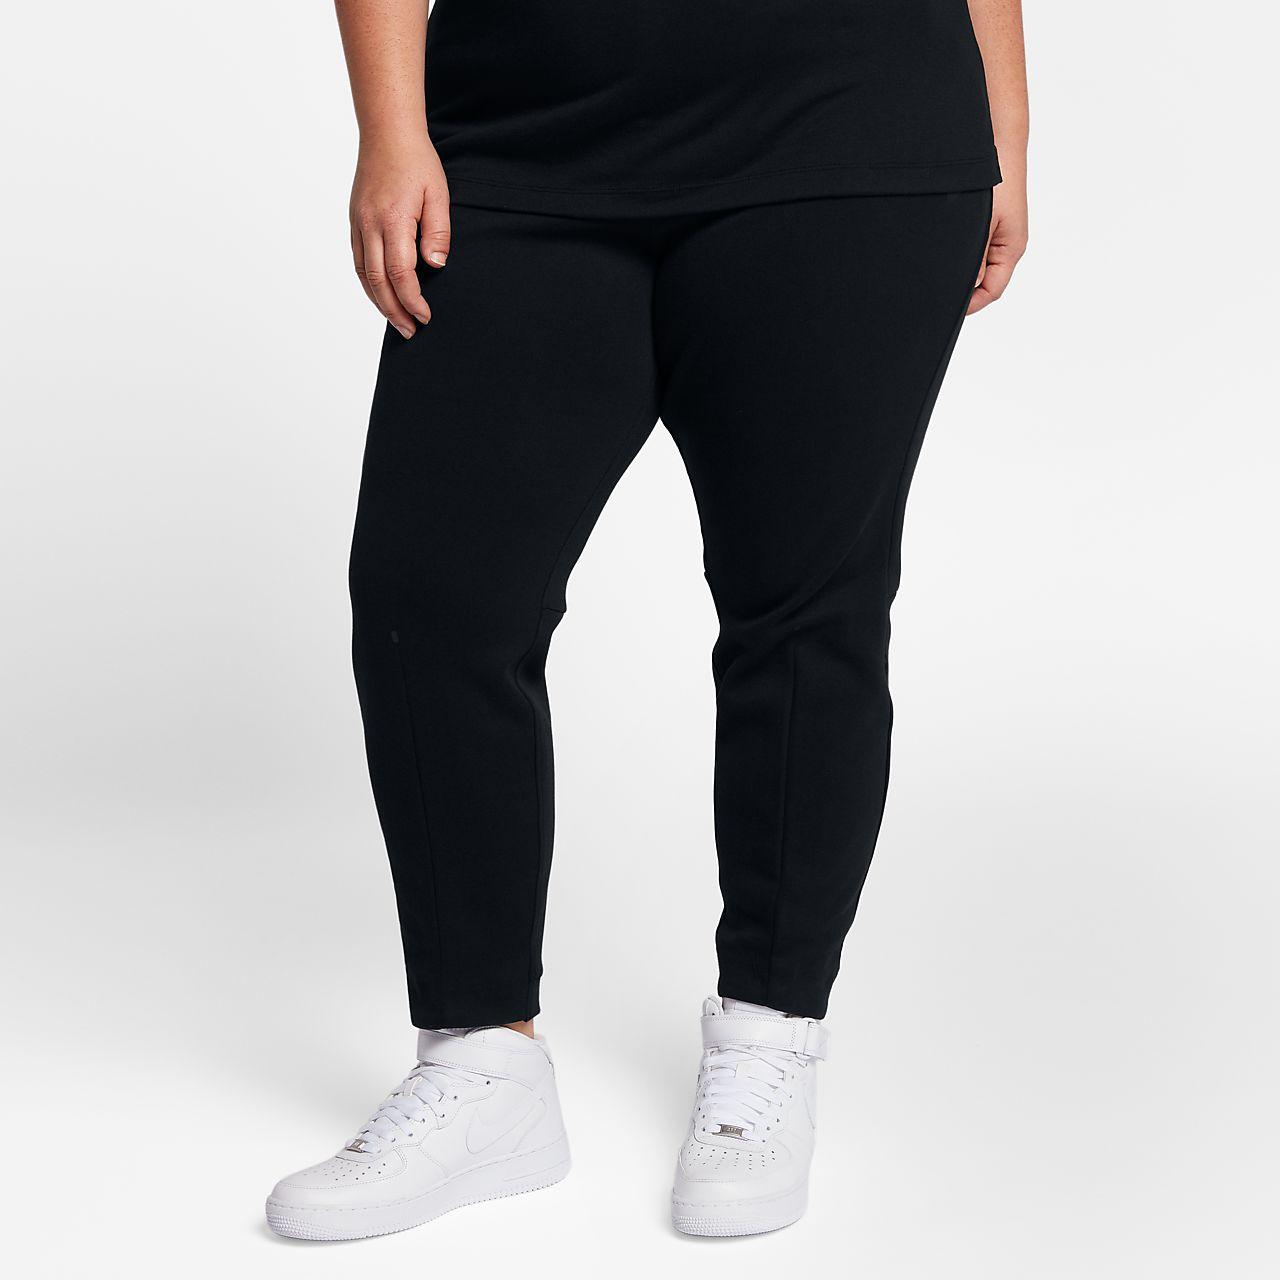 Pantalones para mujer Nike Sportswear Tech Fleece (talla grande)